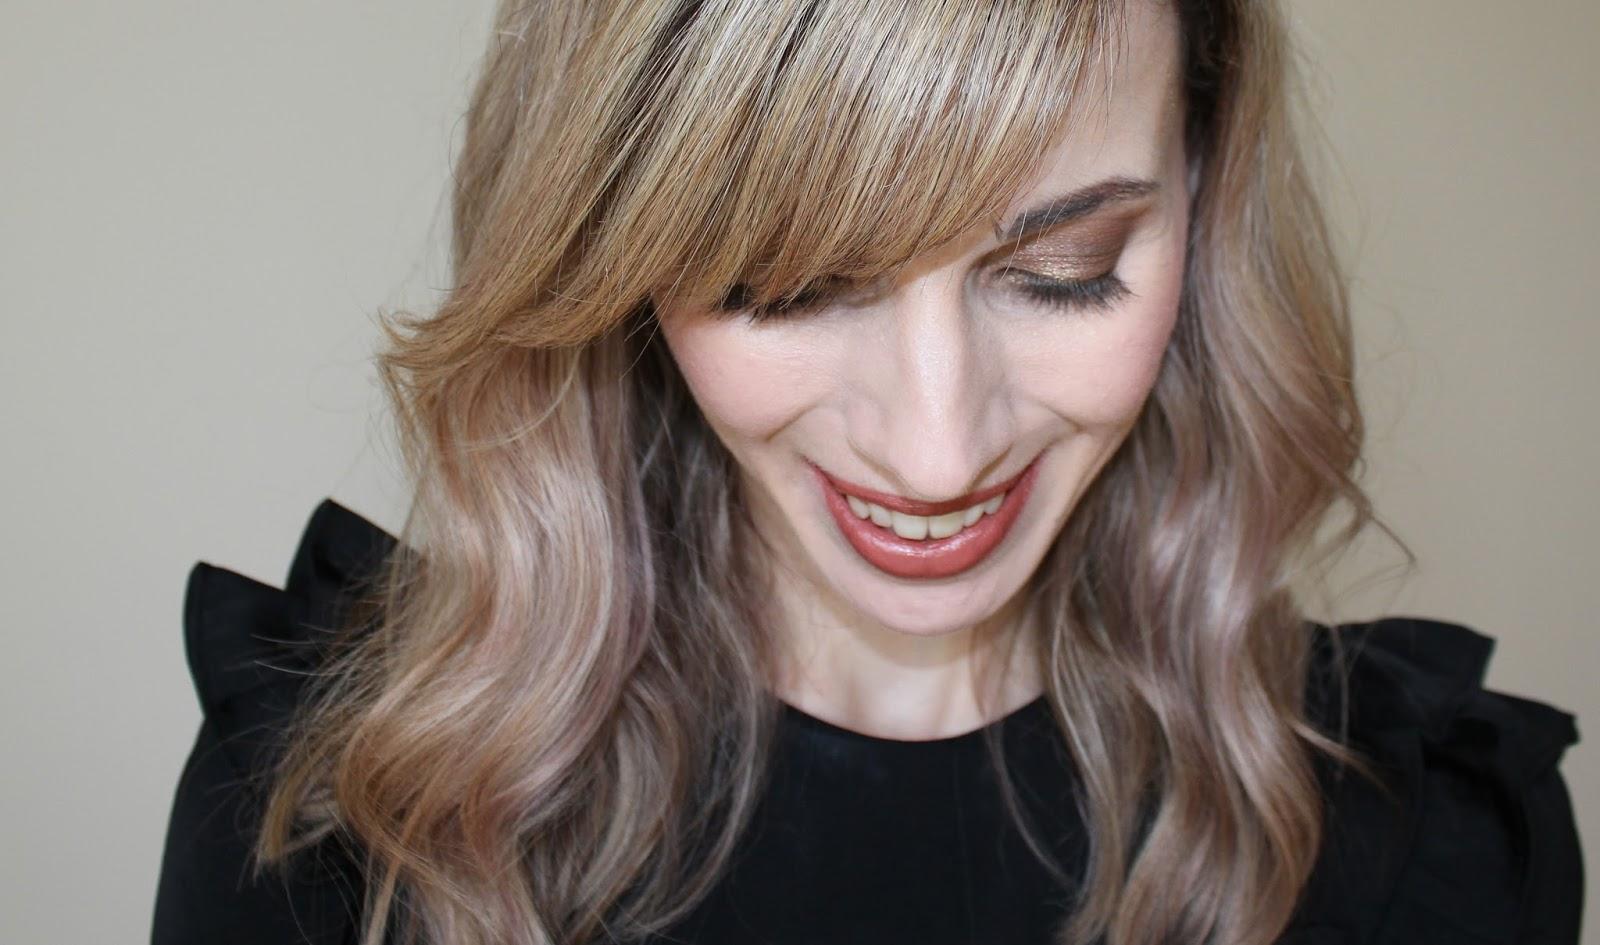 Emma Stone Oscars Inspired Makeup Look - 9